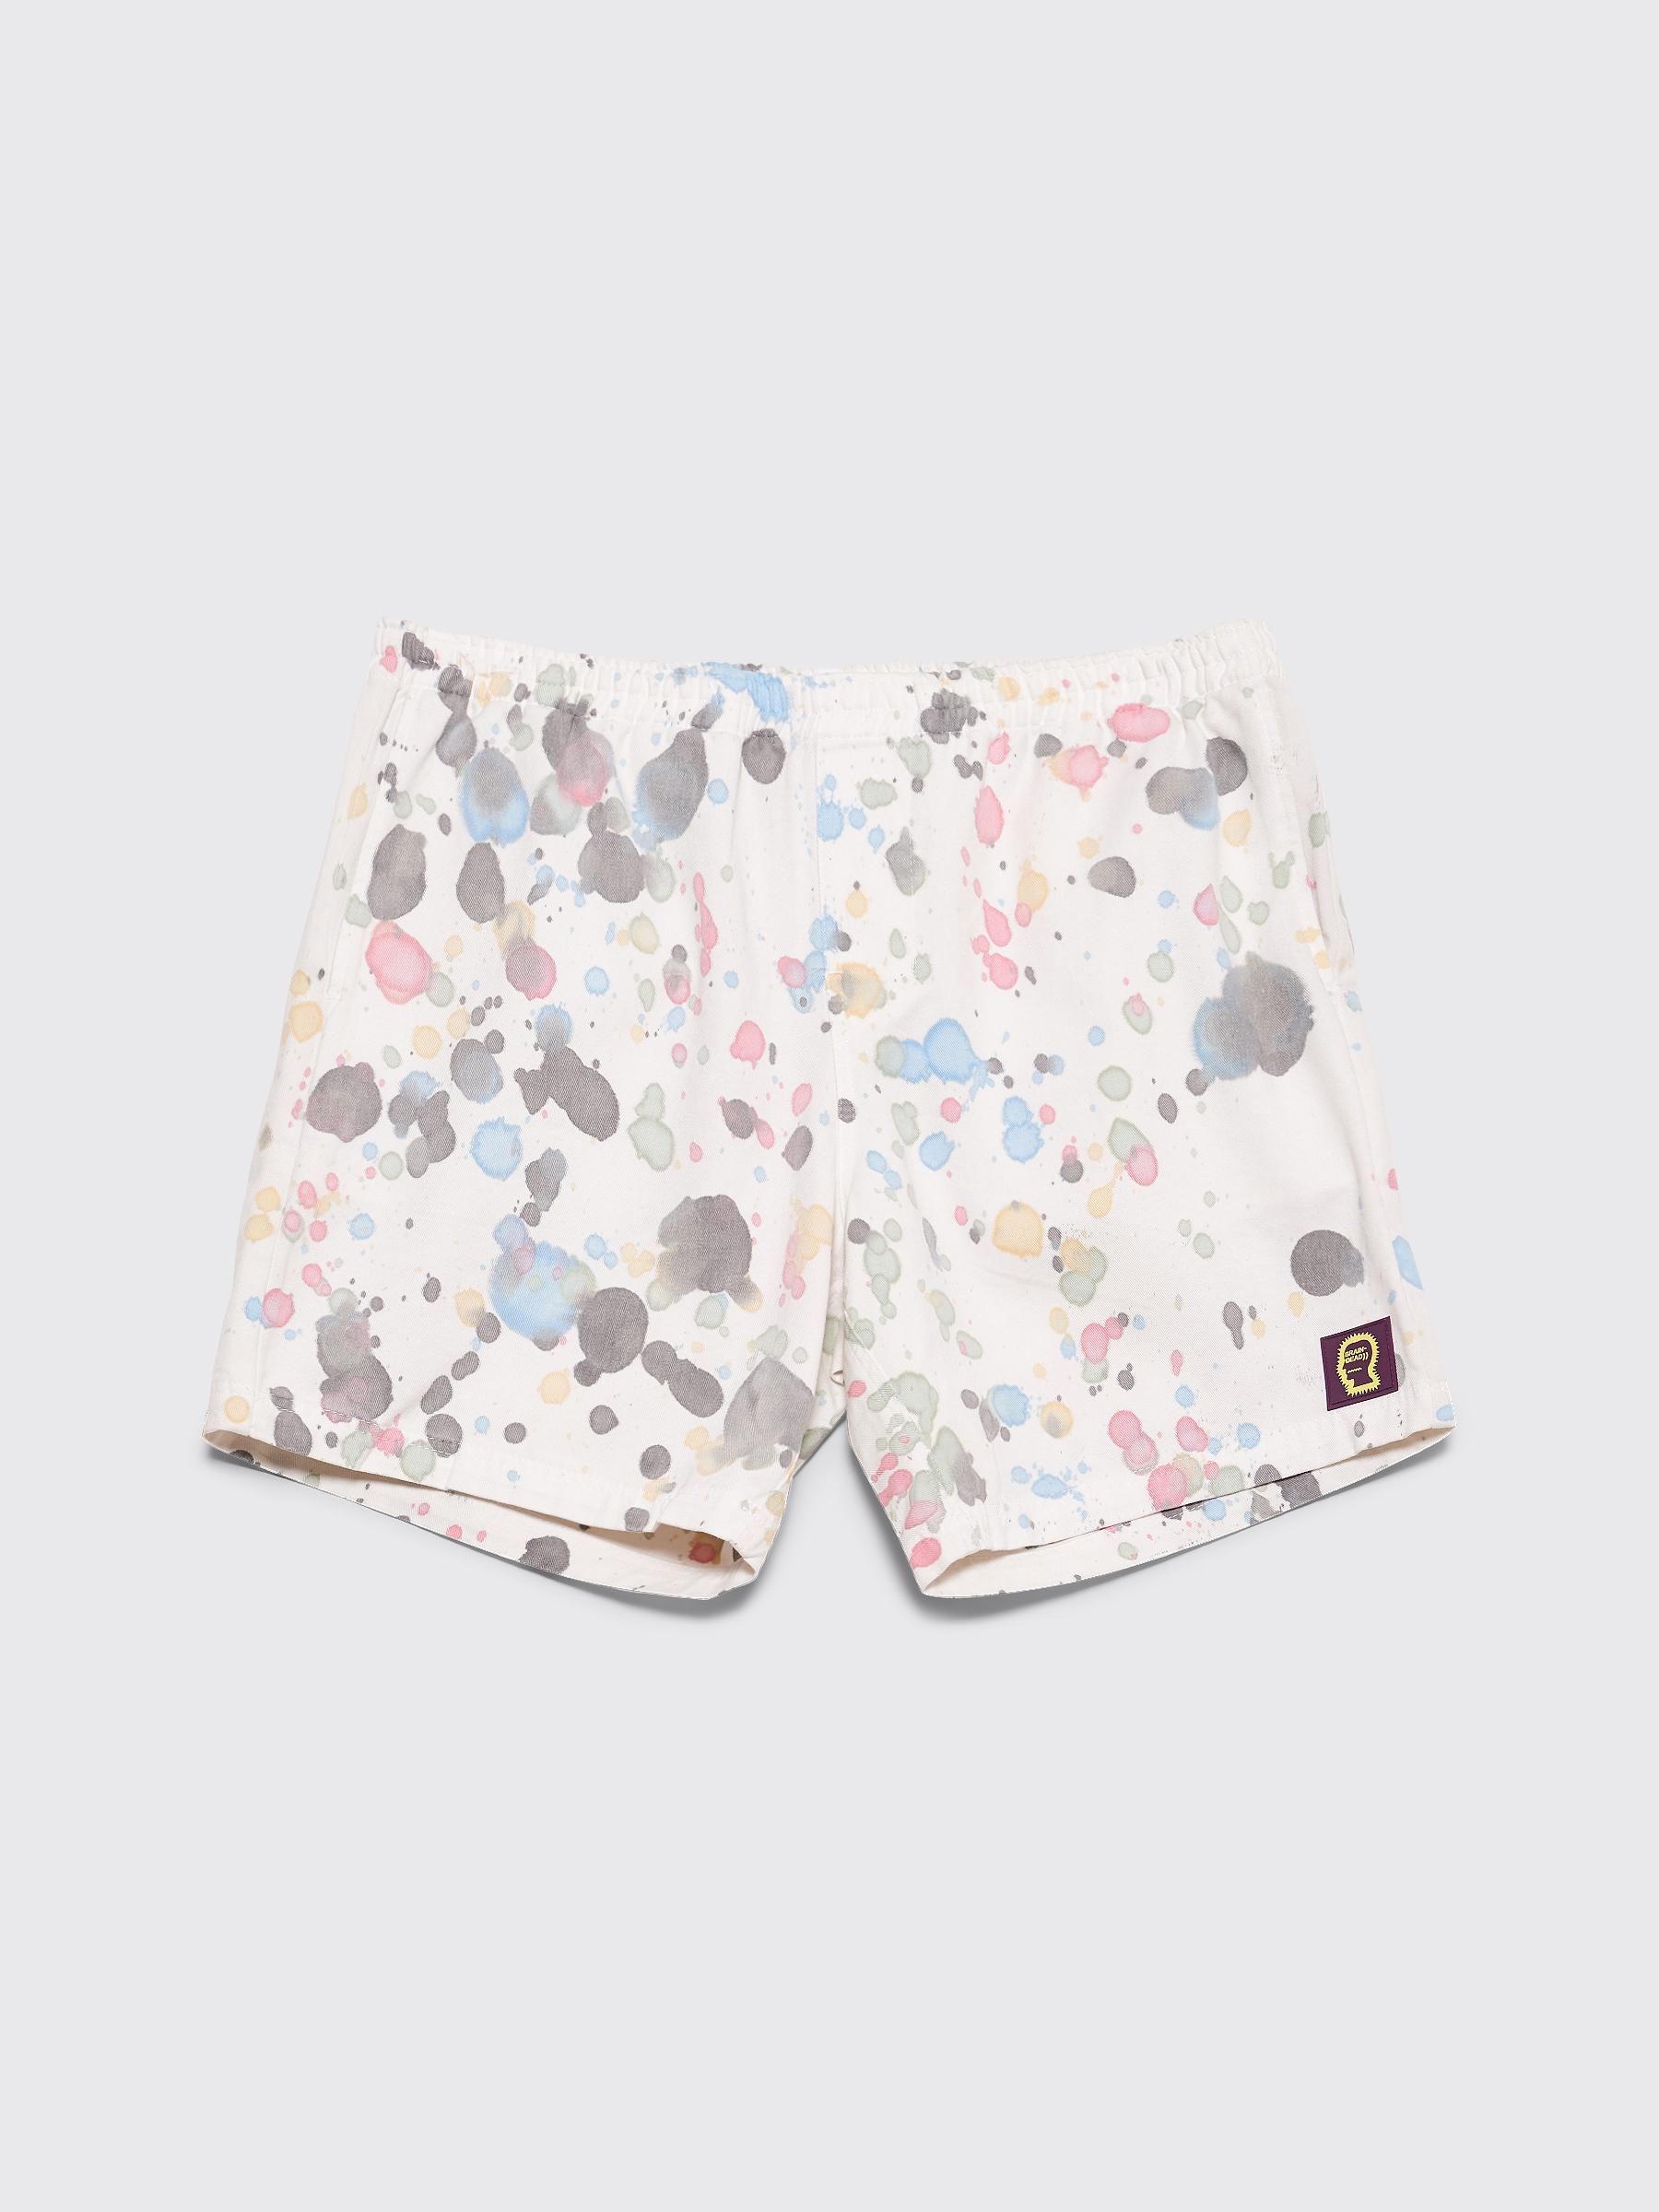 7509e9fb9da Très Bien - Brain Dead Beach Shorts Multi Splatter Dye White